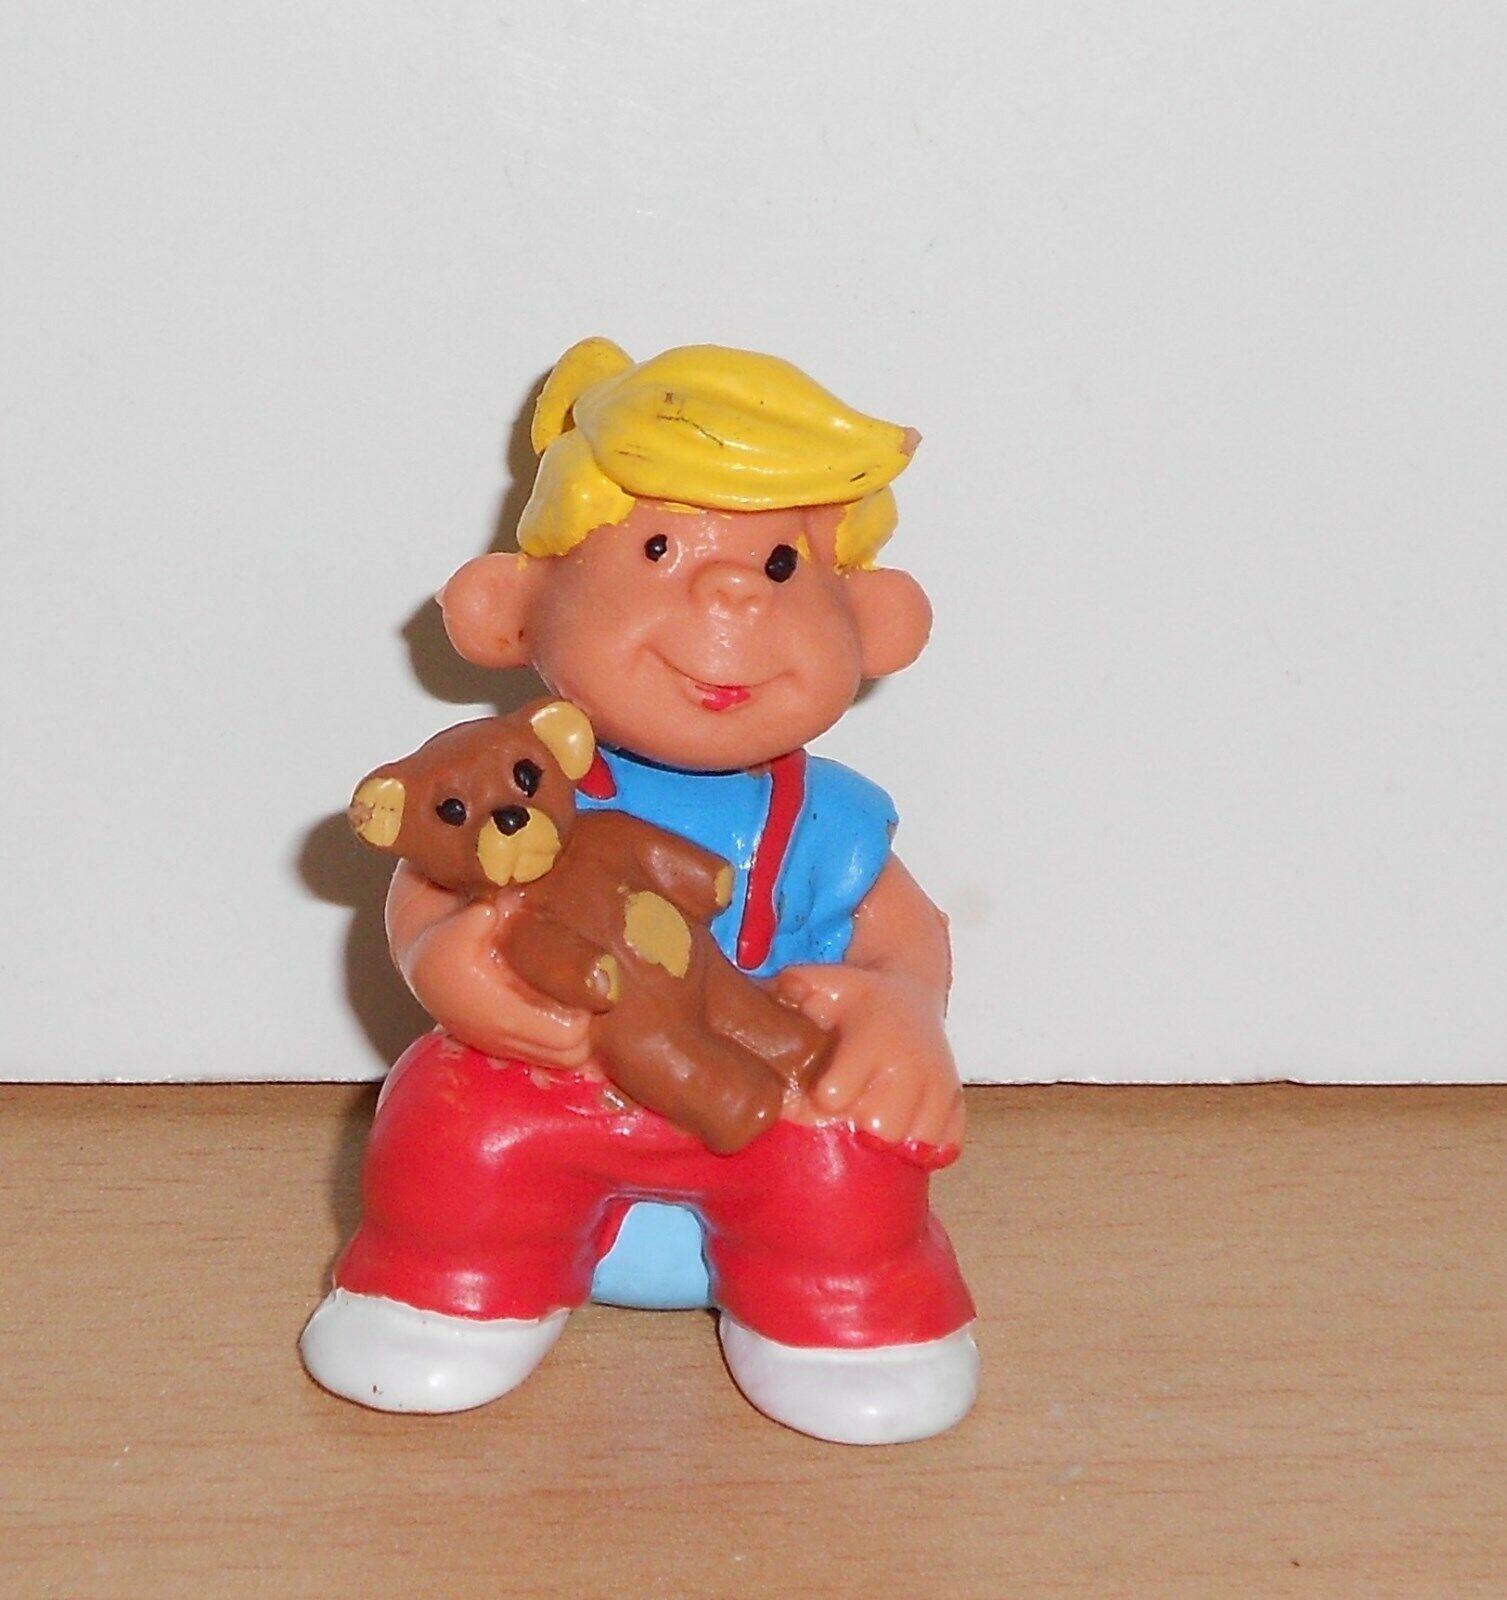 PVC TOY FIGURE Figurine DENNIS THE MENACE - SITTING - 1980's